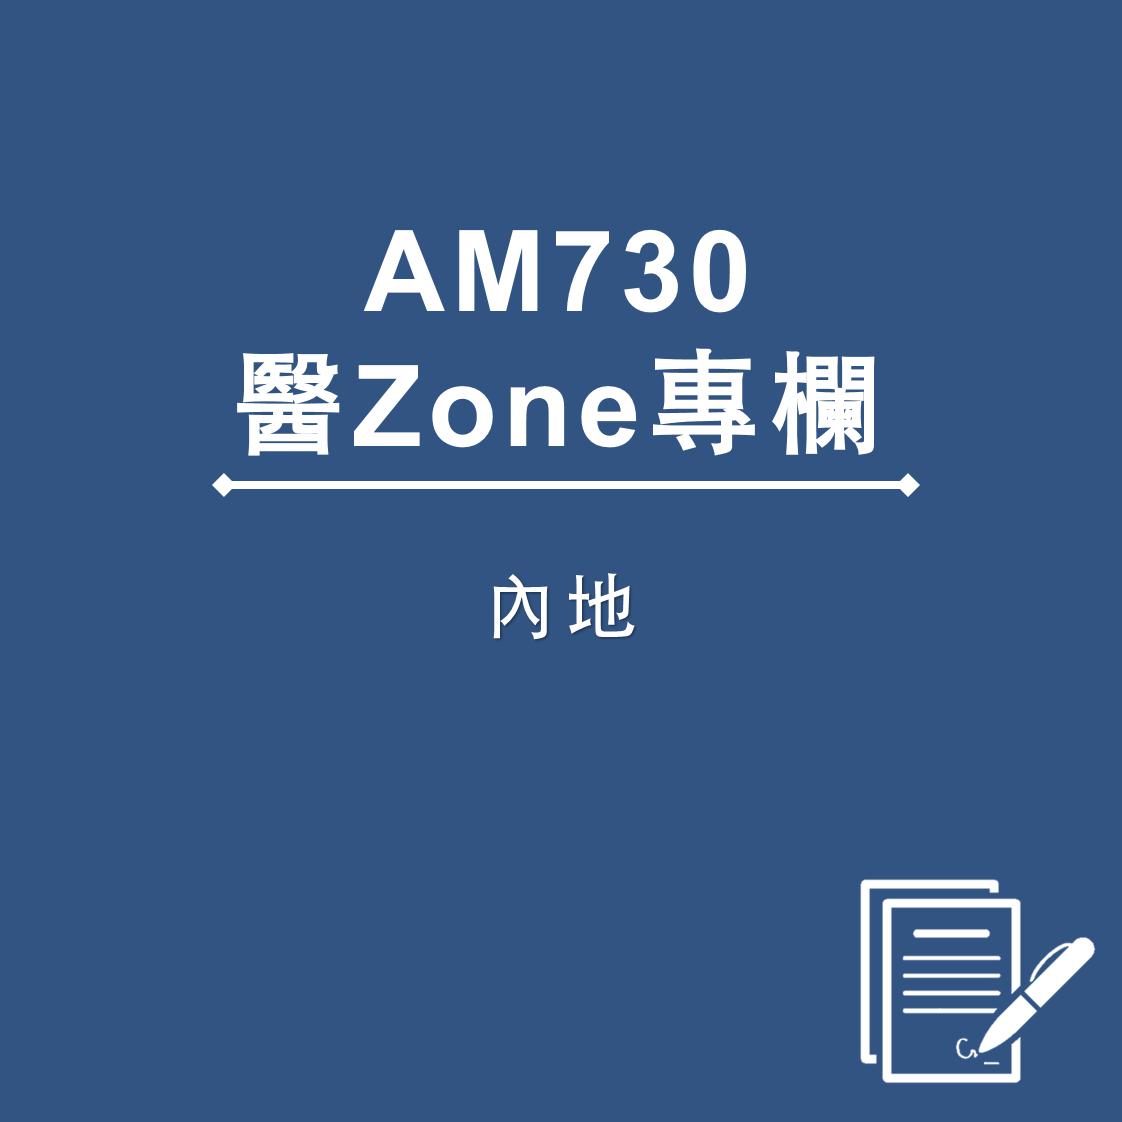 AM730 醫Zone 專欄 - 內地